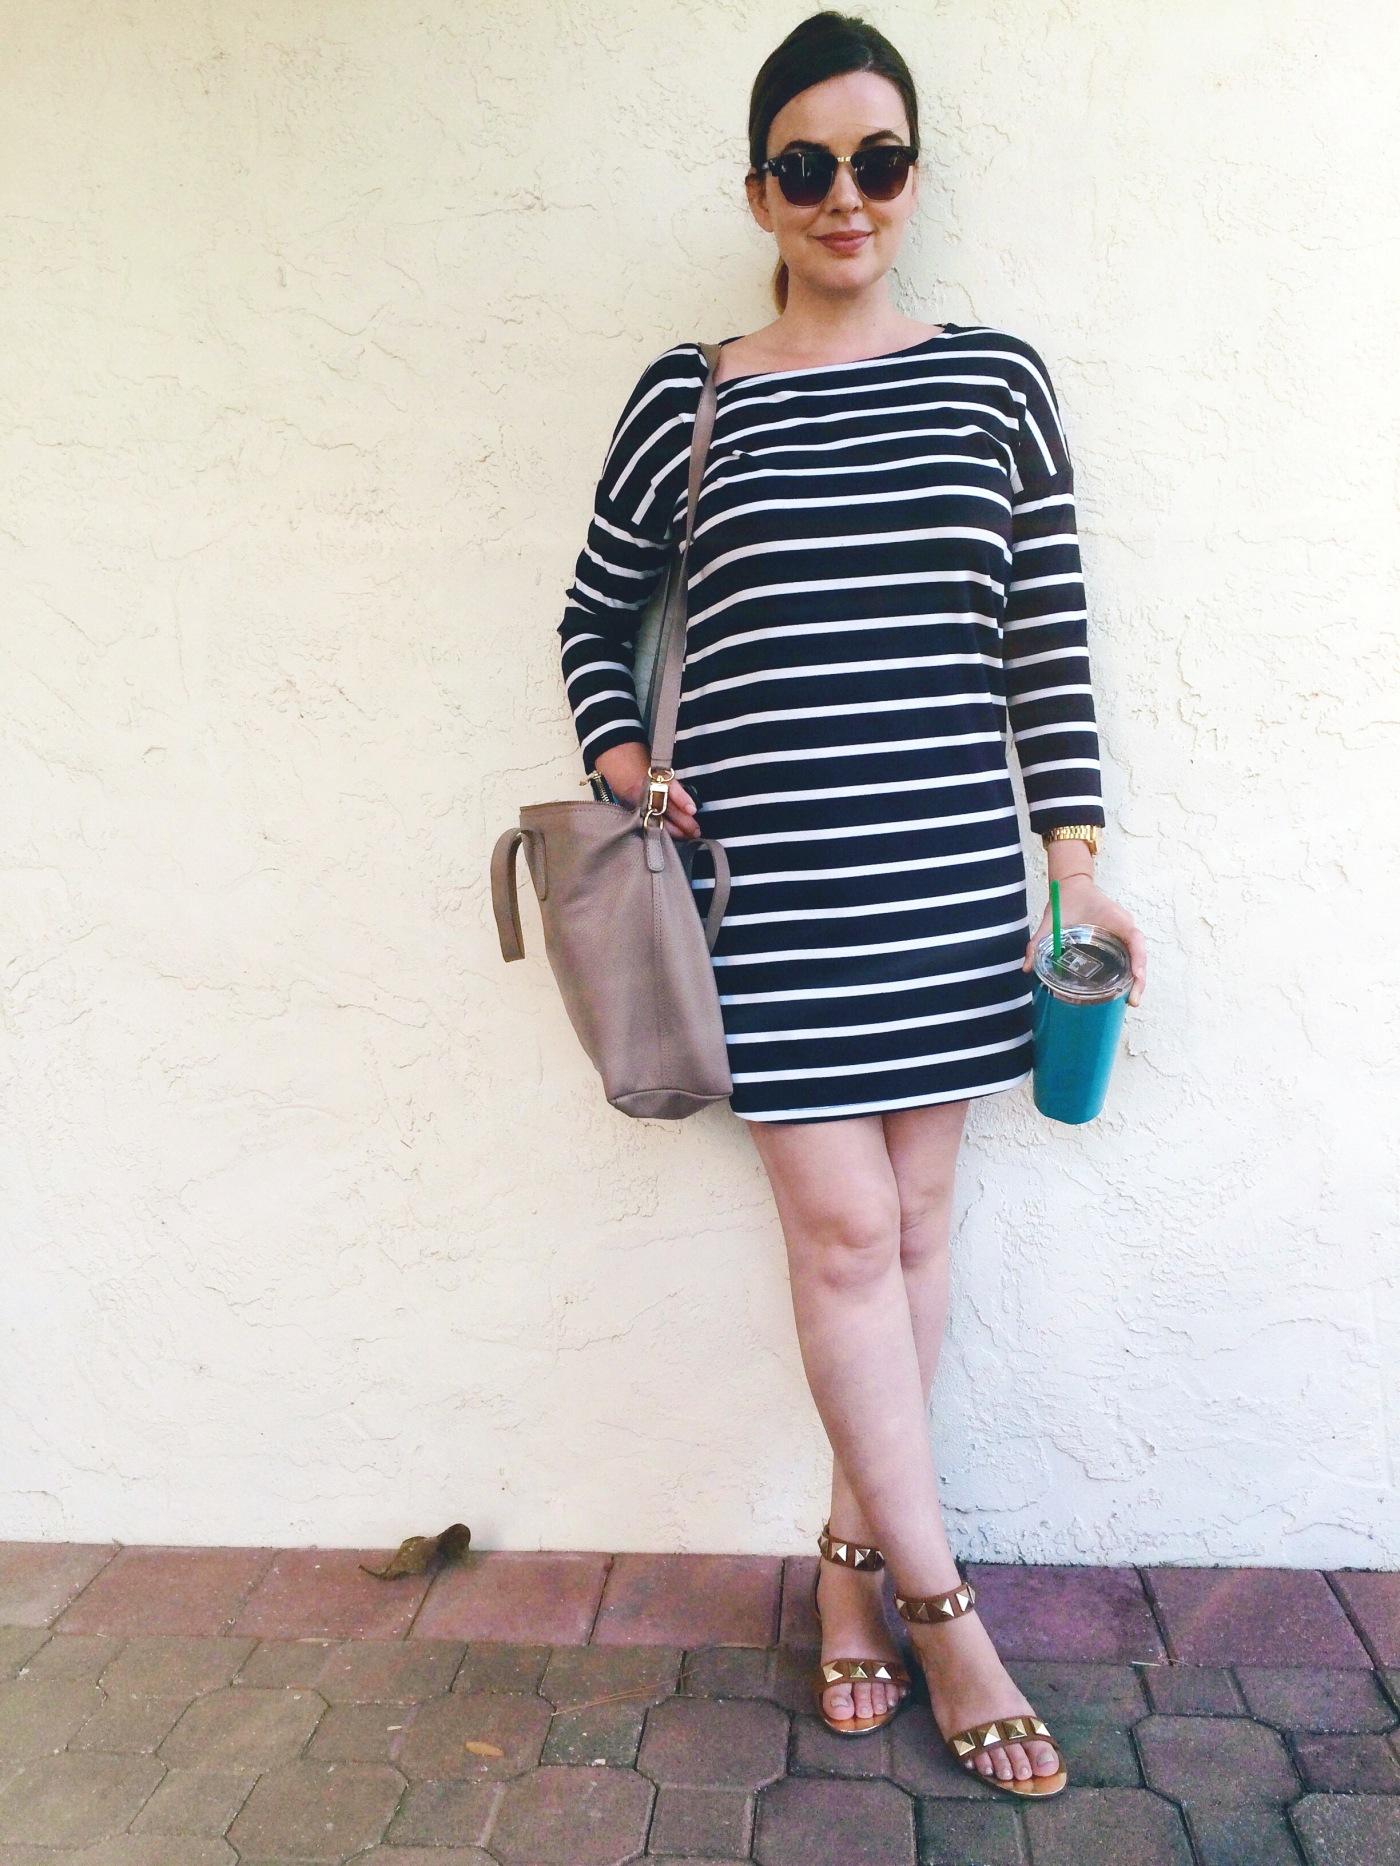 Casual OOTD: Striped BB Dakota dress with Cuyana Small Carryall Tote. keiralennox.com